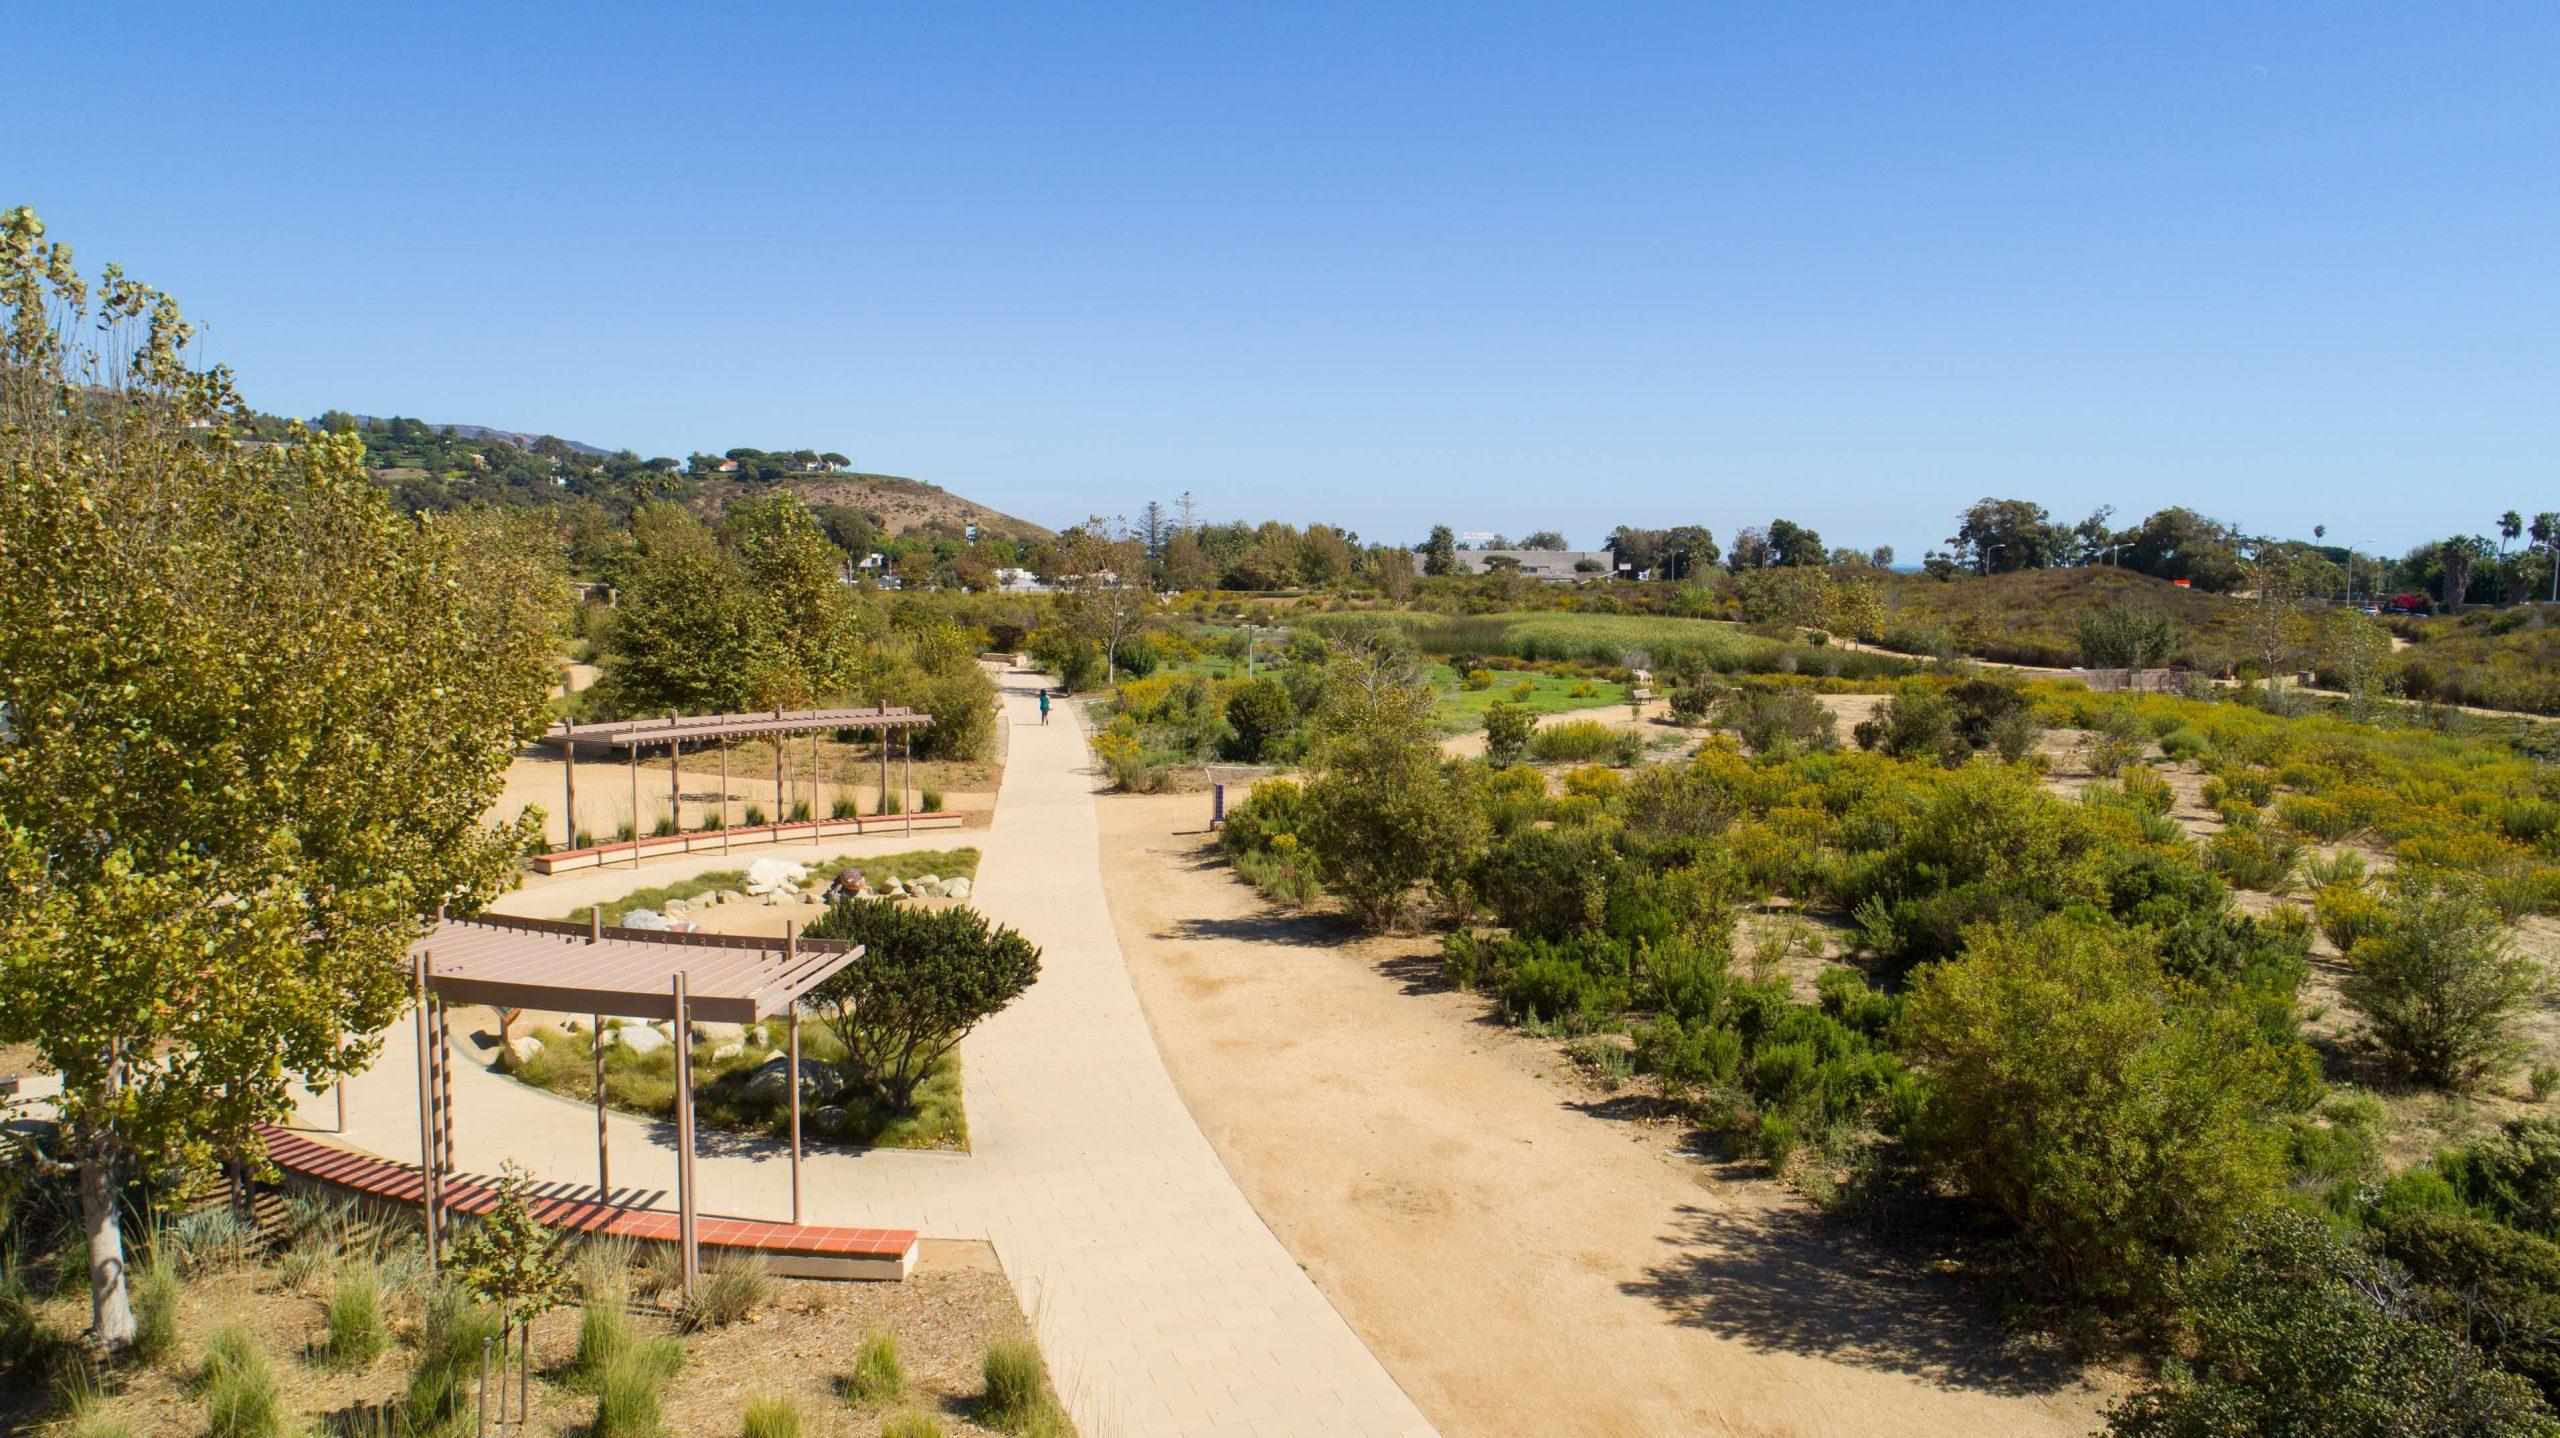 Public works landscaping management